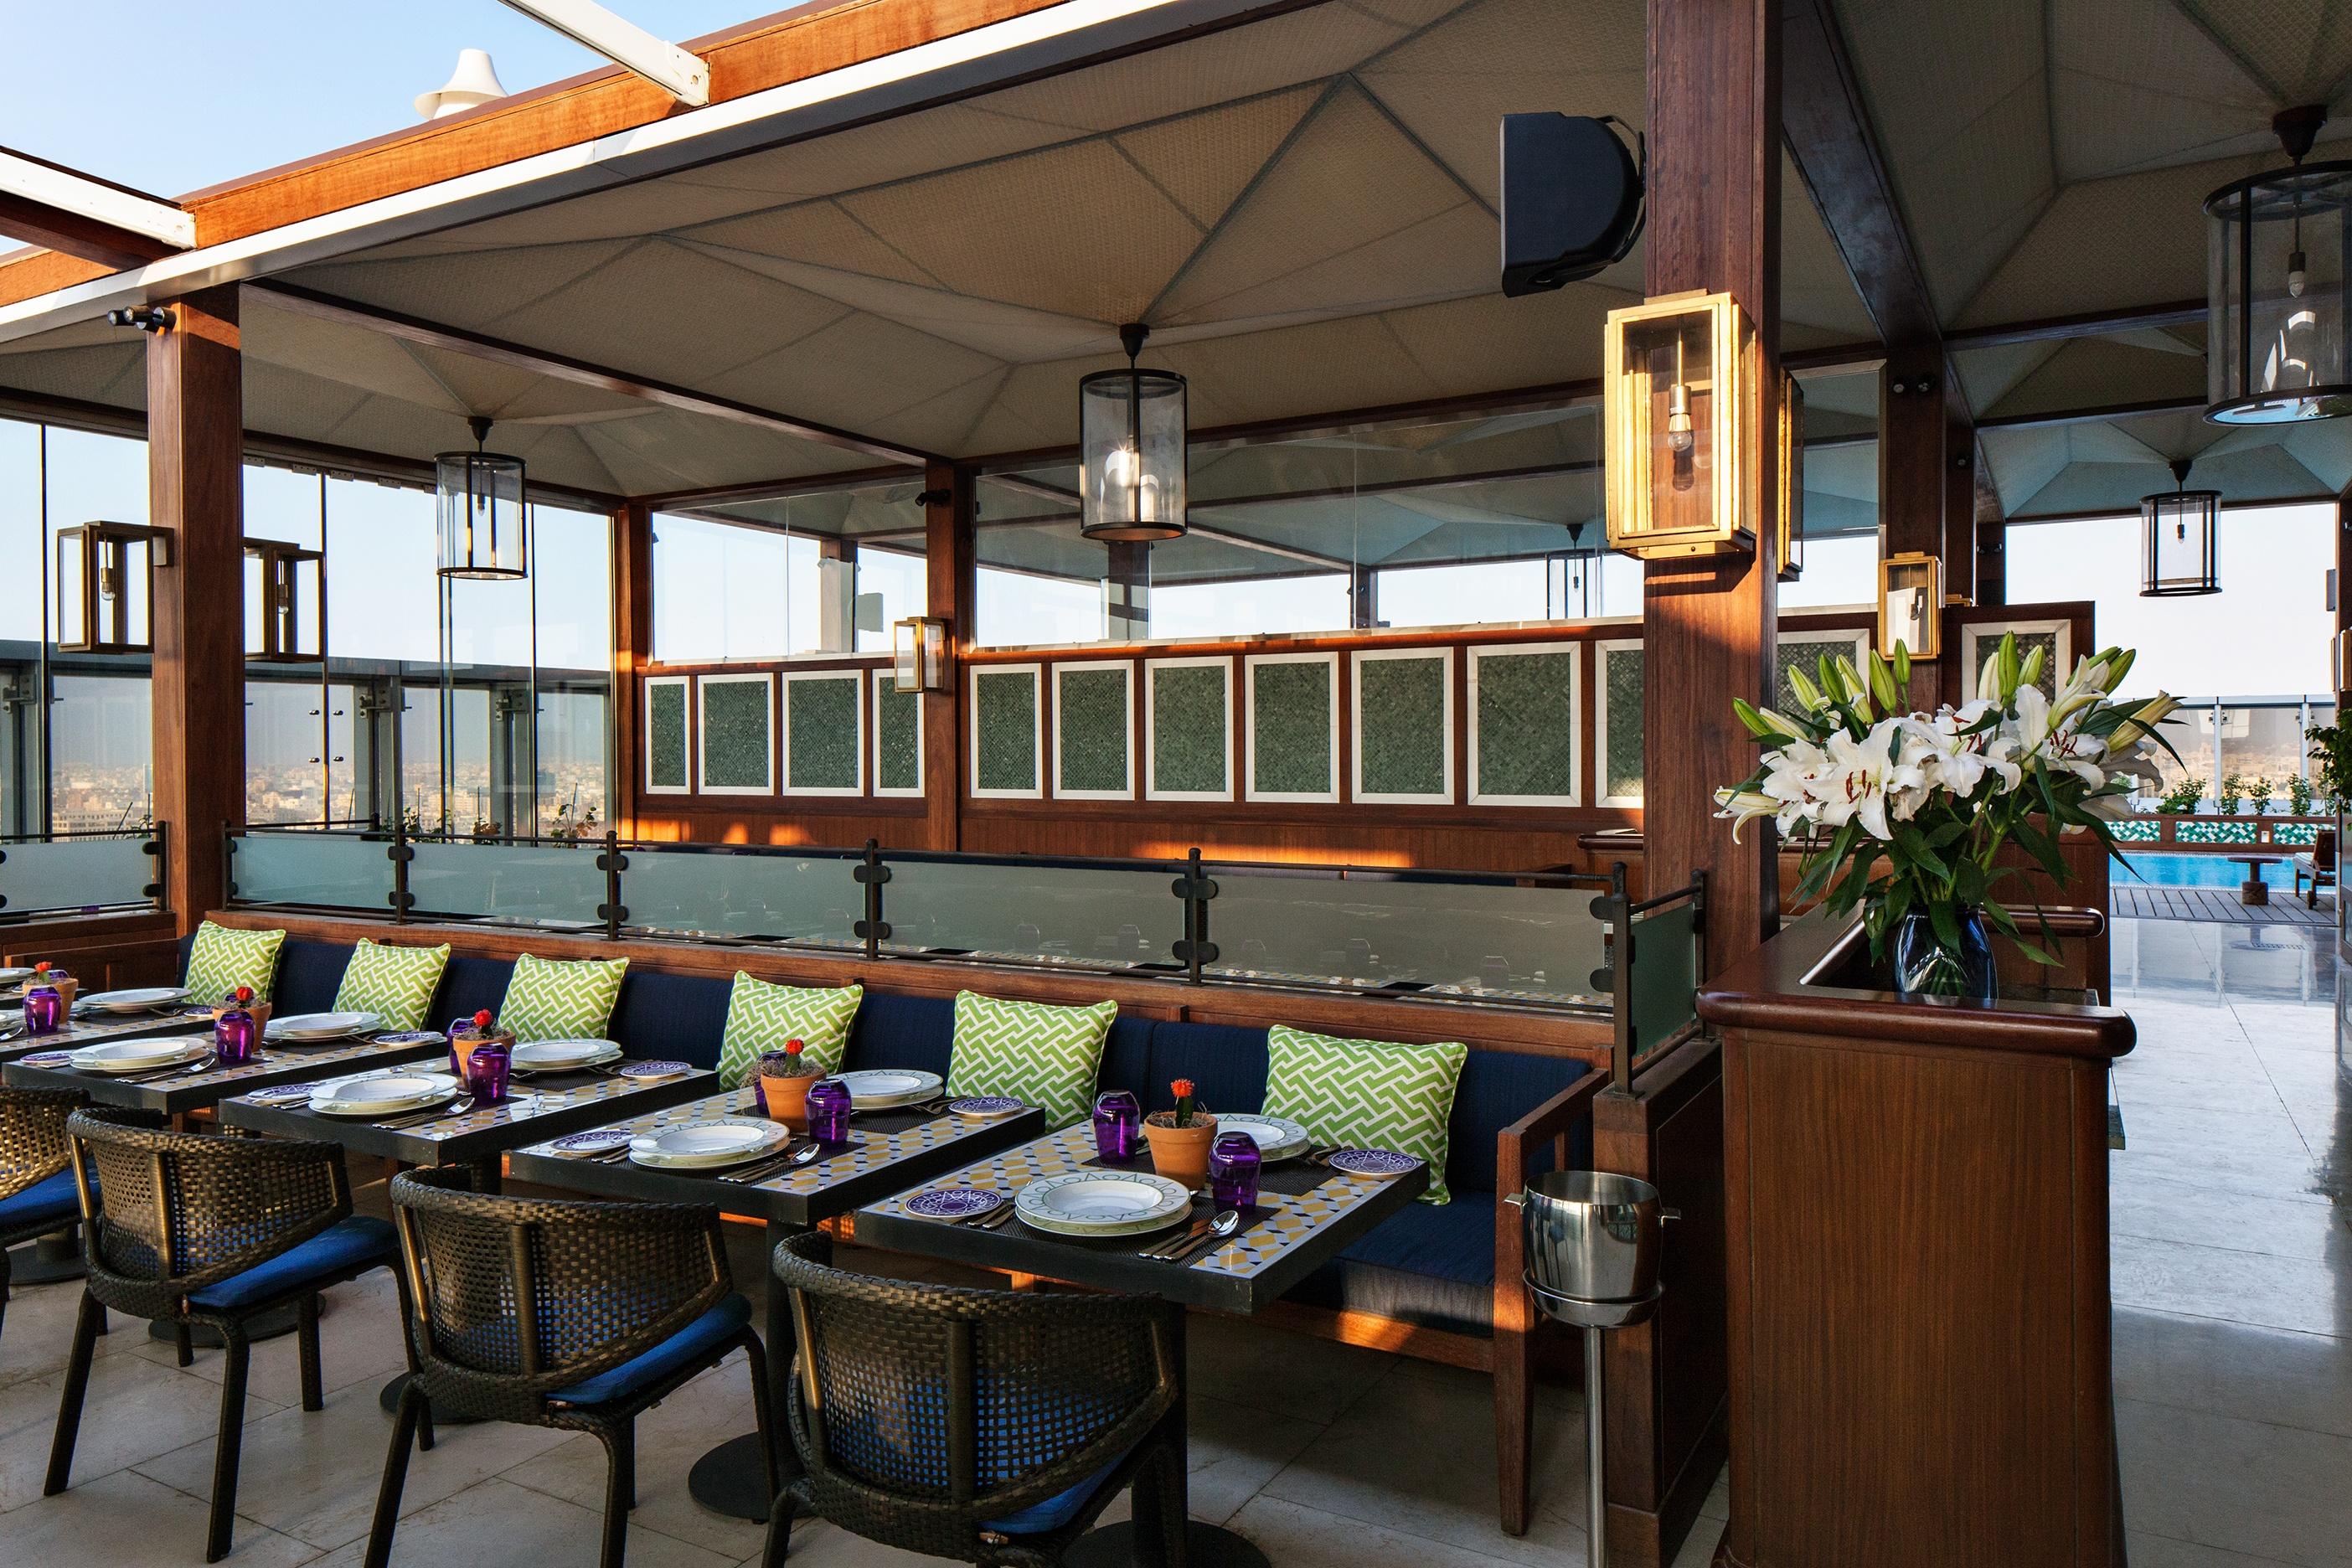 Aubegine at Assila Hotel - Rocco Forte - xnPOS